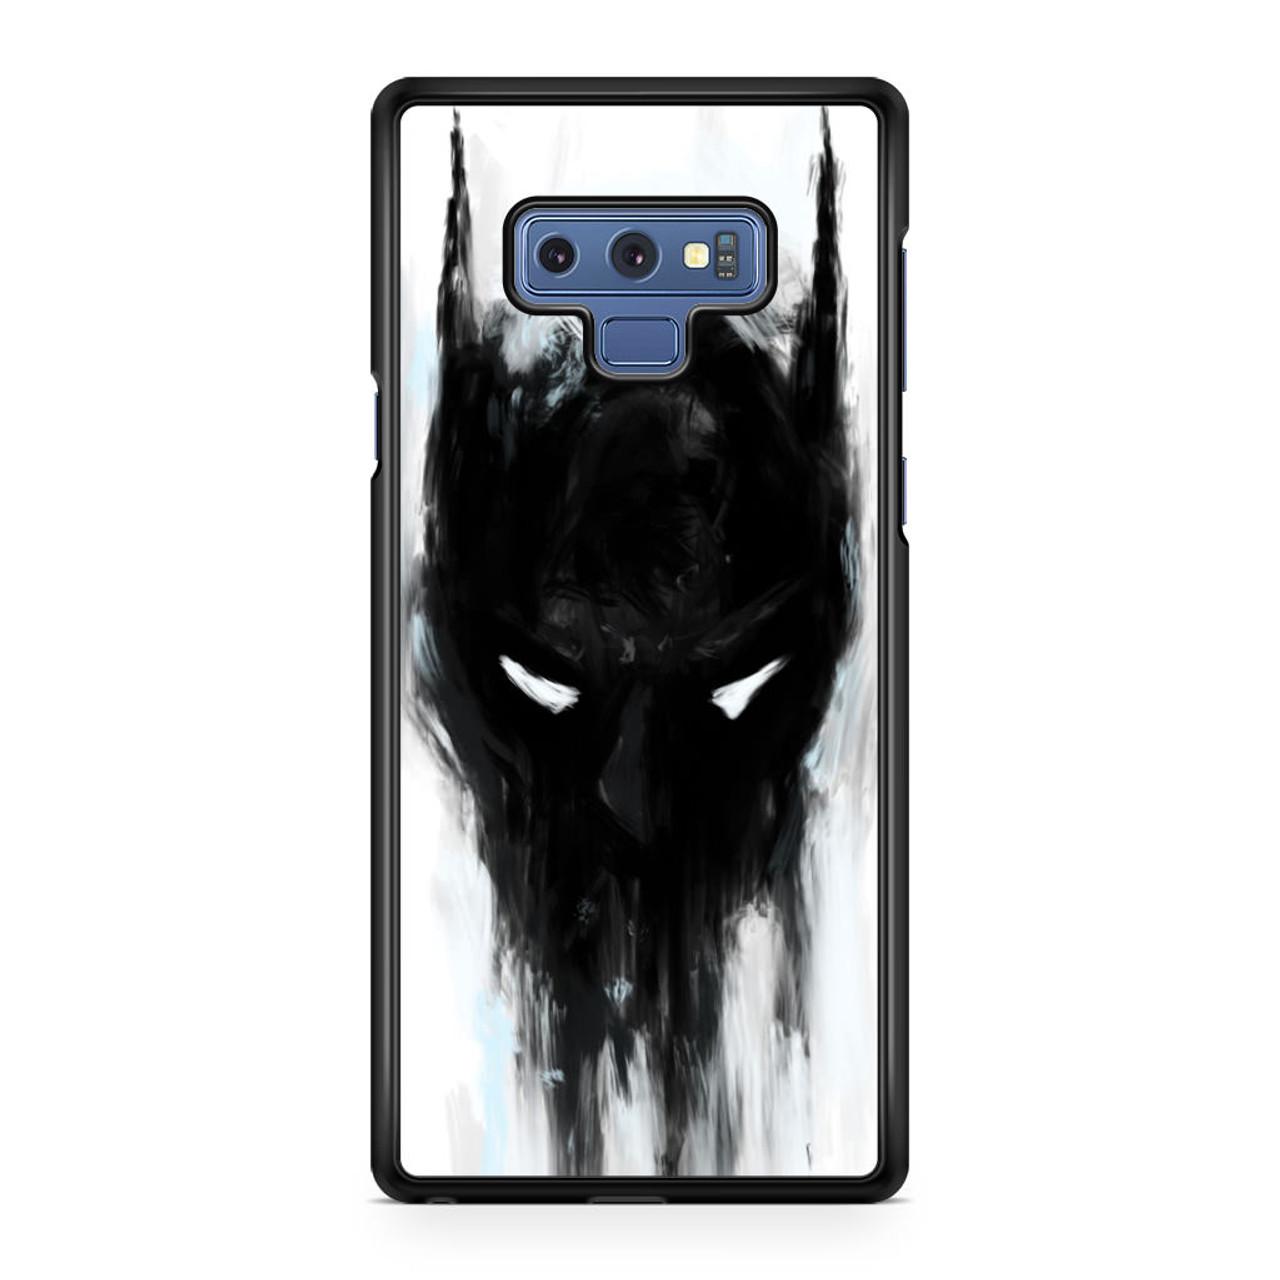 cheap for discount 6c08c d52b7 Batman Painting Samsung Galaxy Note 9 Case